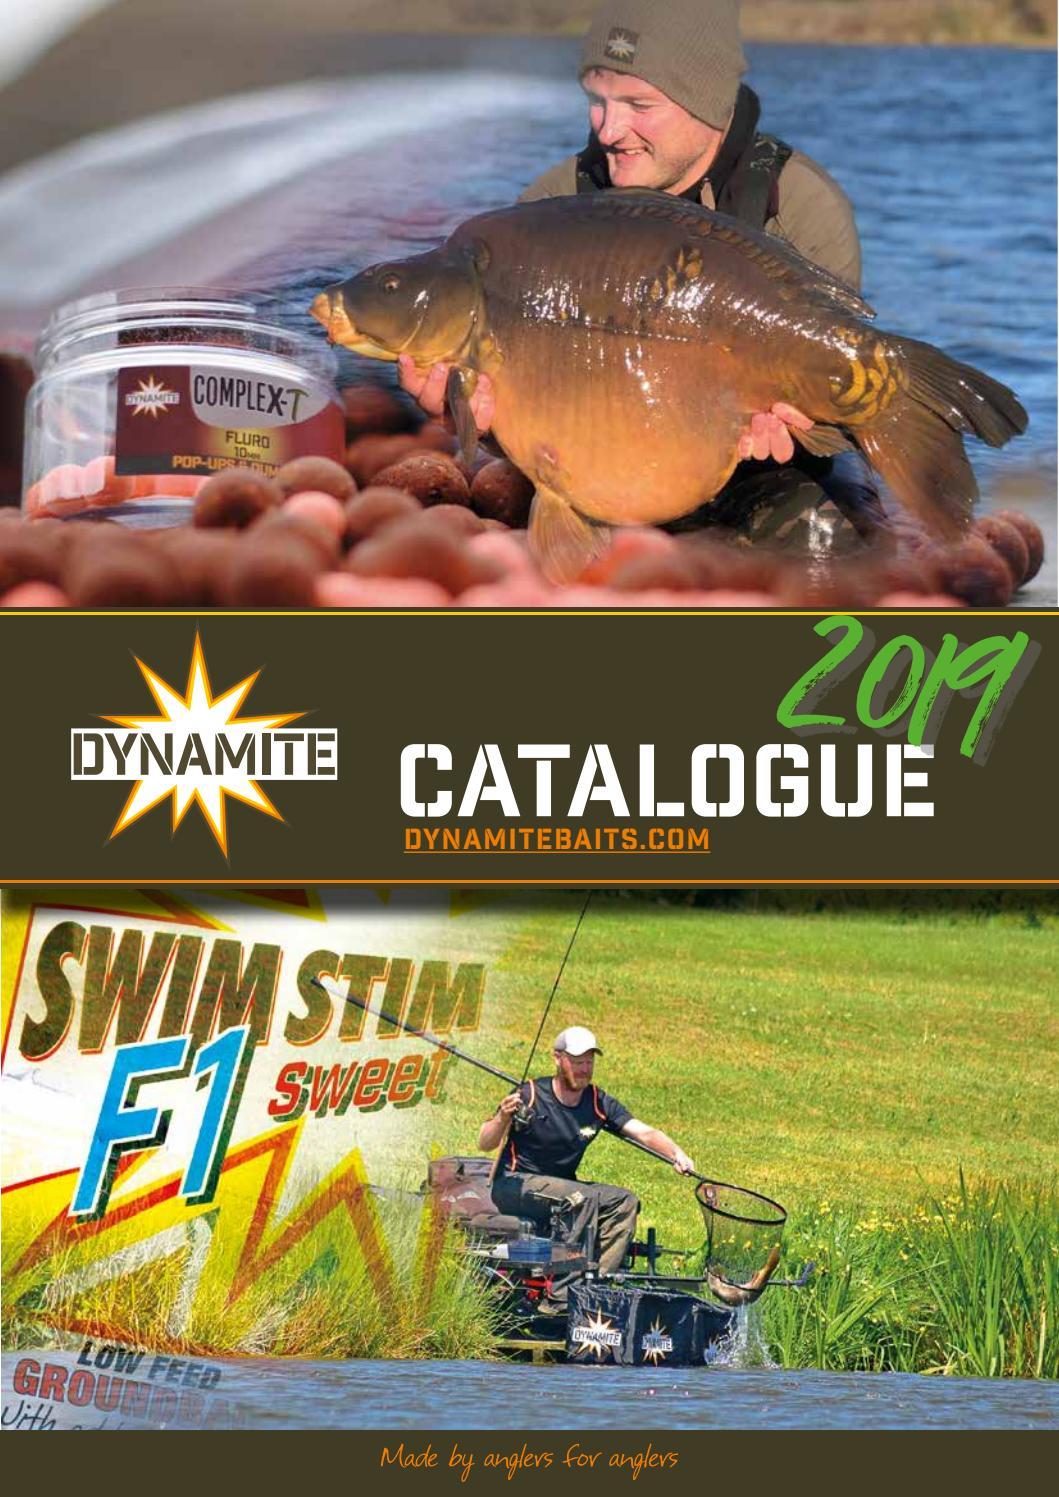 Dynamite Swim-Stim Silver Fish Groundbait 900g Koi Technology *COARSE CARP